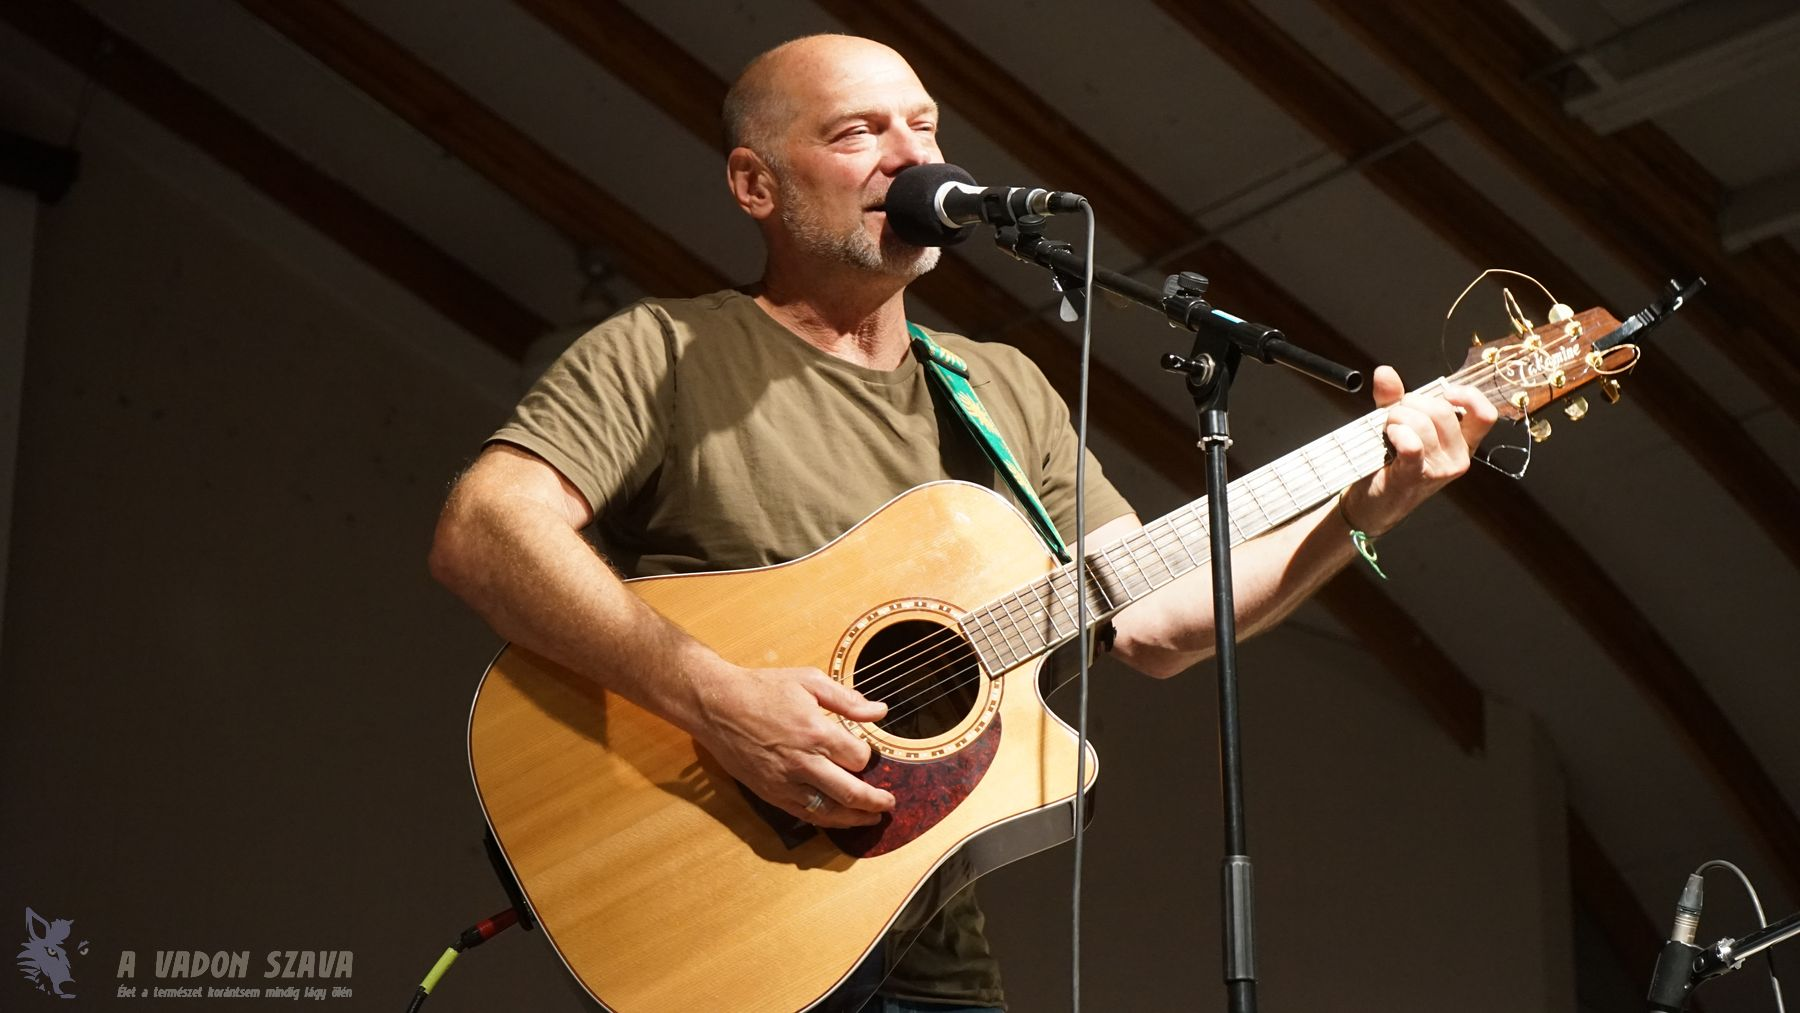 Les Stroud koncertje a Bushcraft Symposium záróestjén.